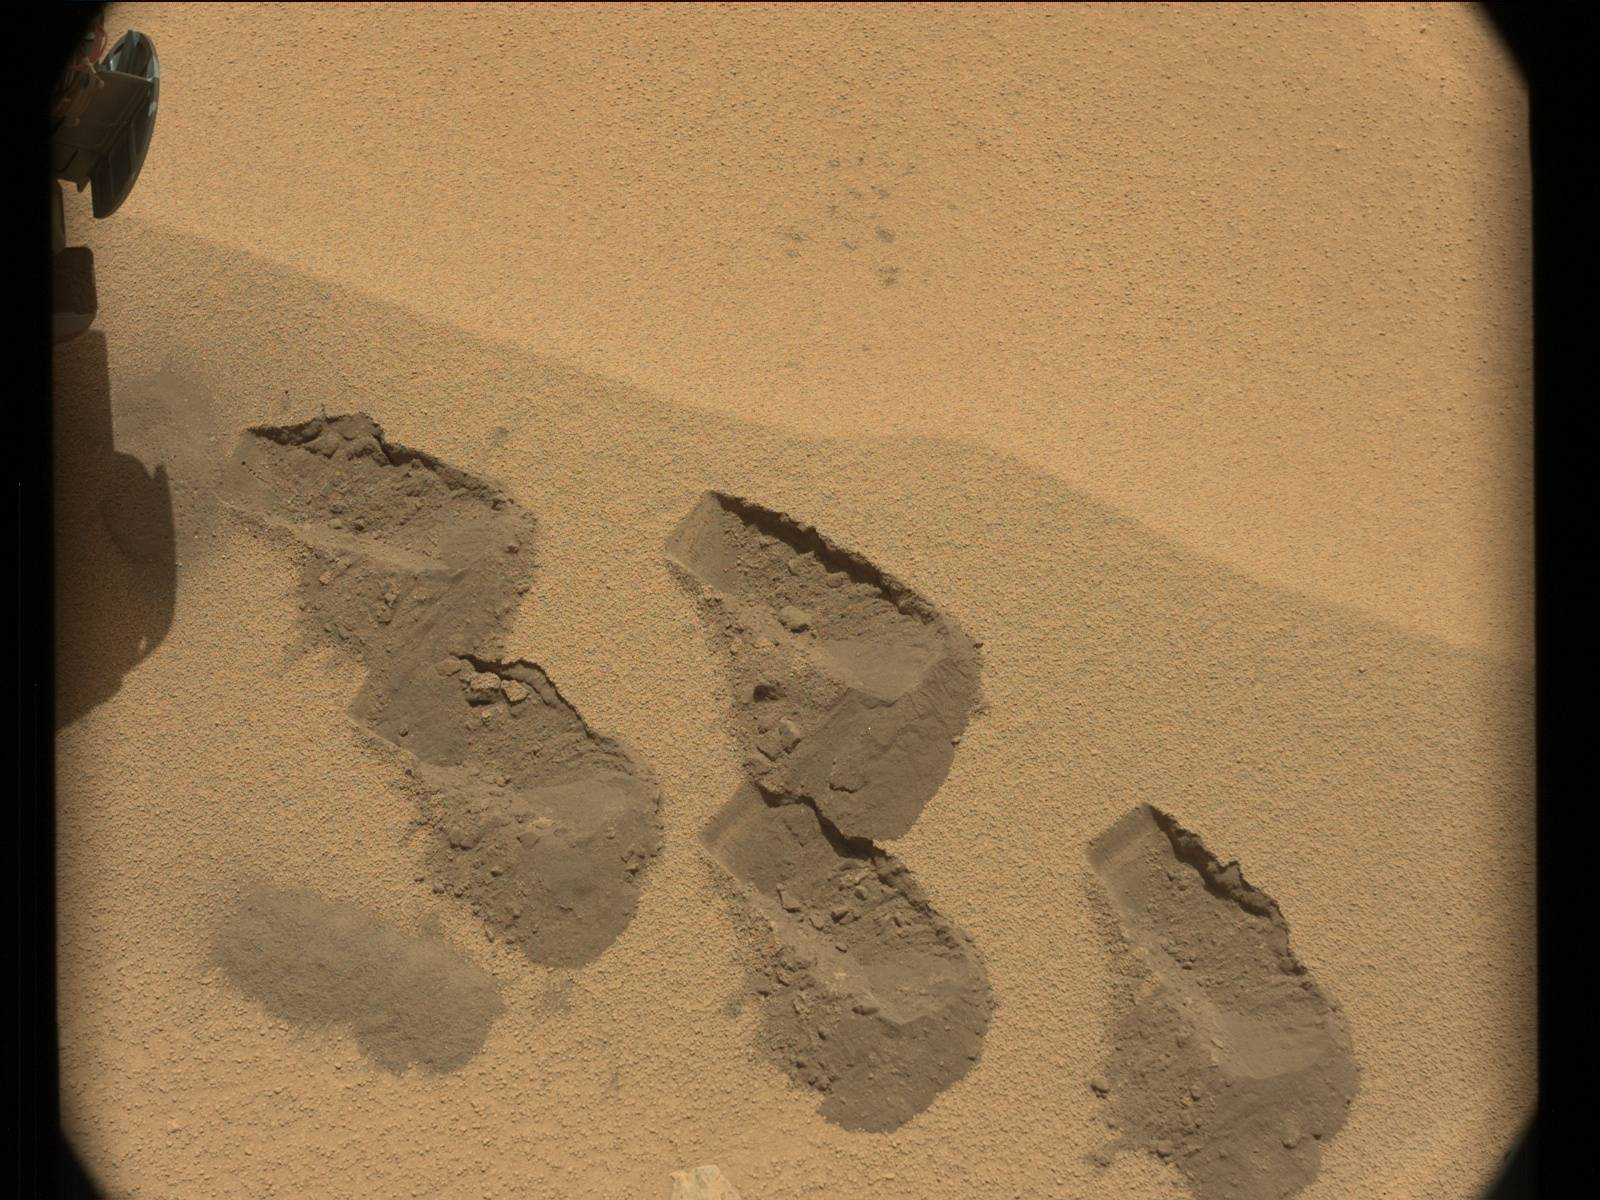 Imagen de la toma de muestras realizada en Rocknest por el Curiosity. NASA/JPL/MSSS.